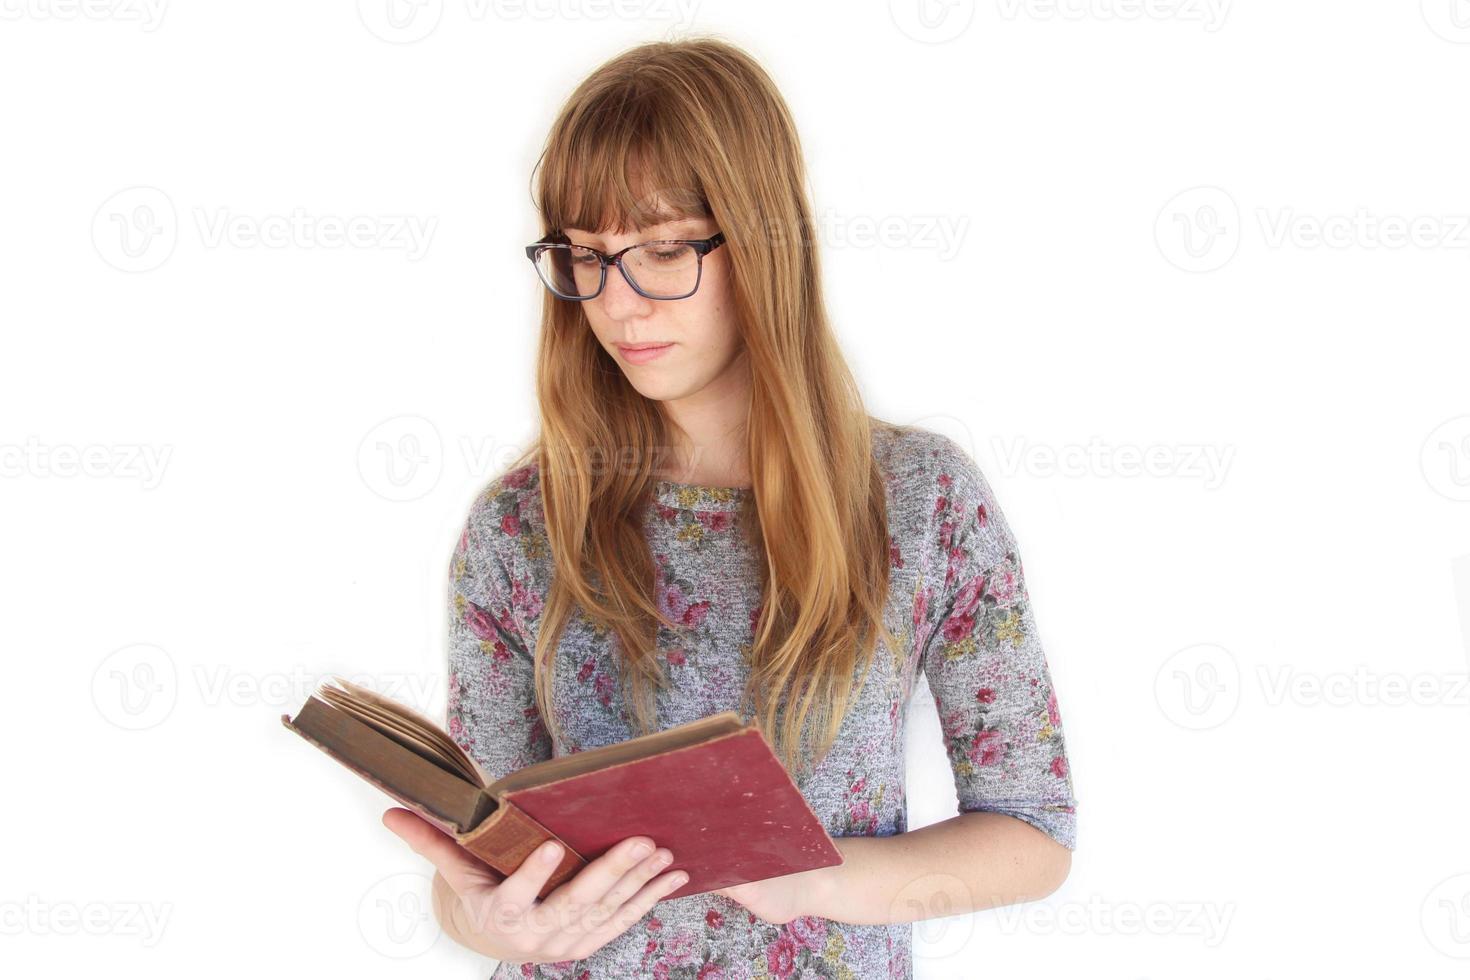 tienermeisje leesboek foto